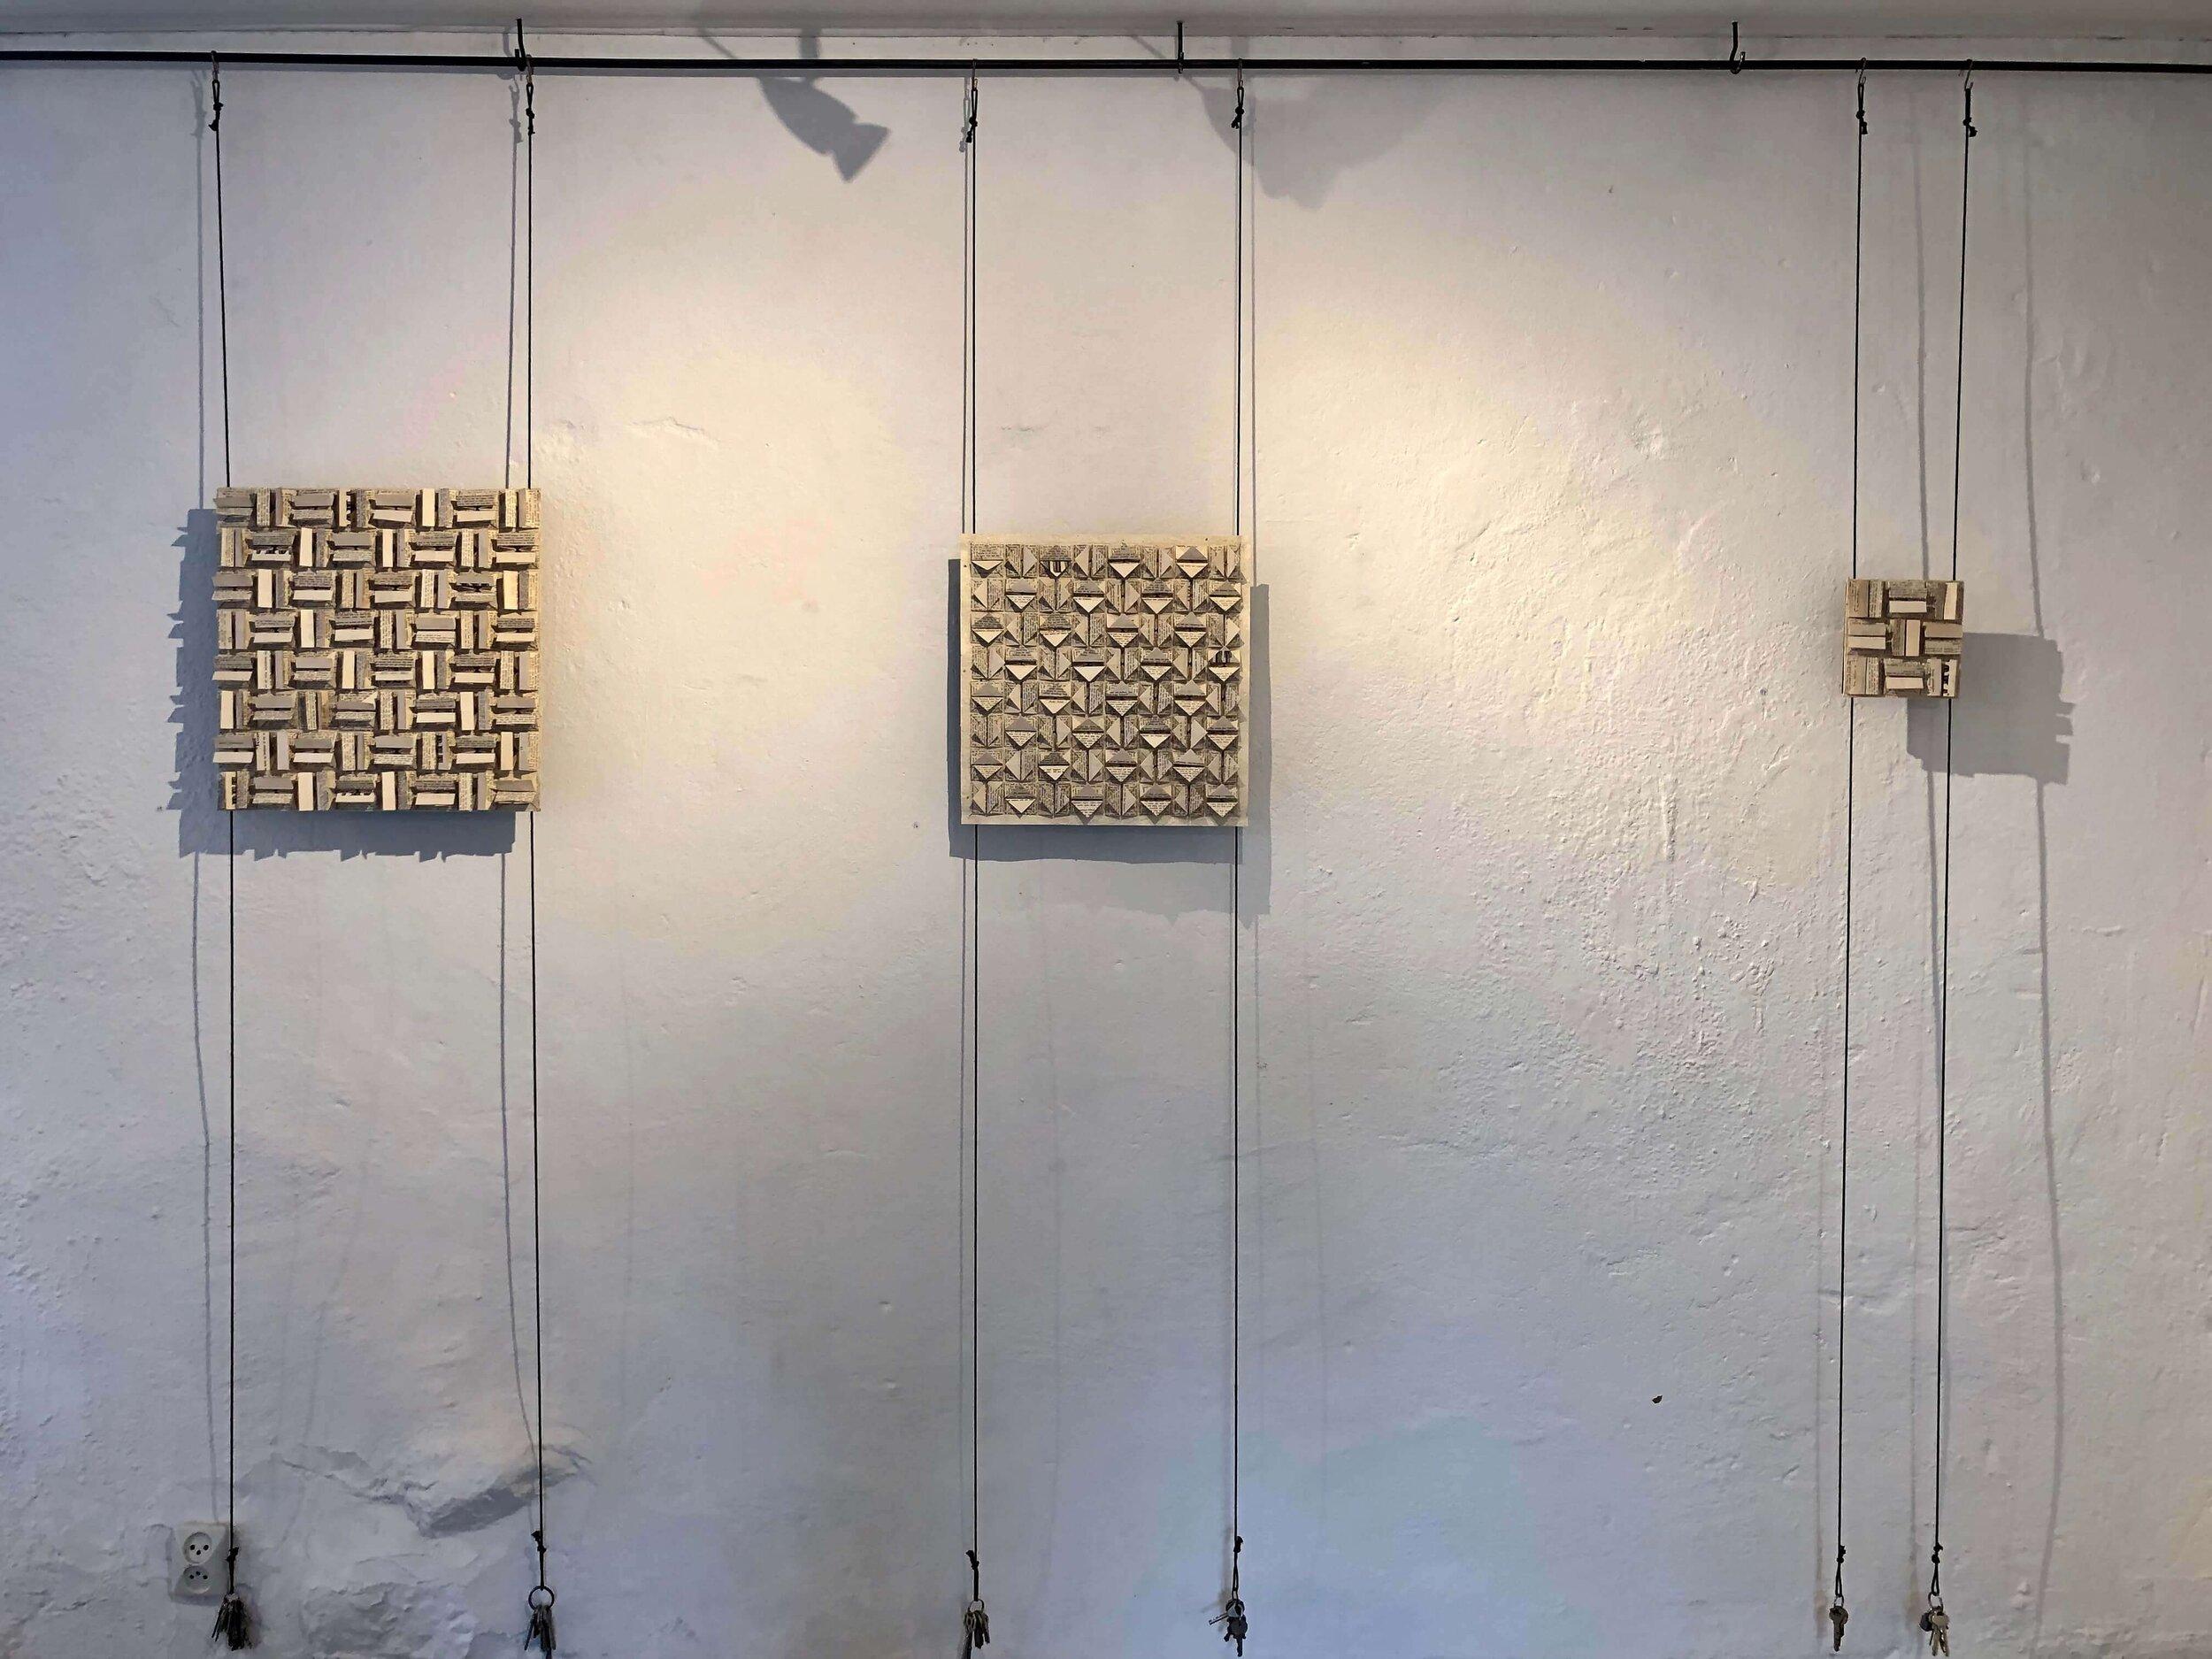 Linda-Allard-Forsman--Tomas-Robefelt--papper--sadelmakarlangan--2019--14.jpg